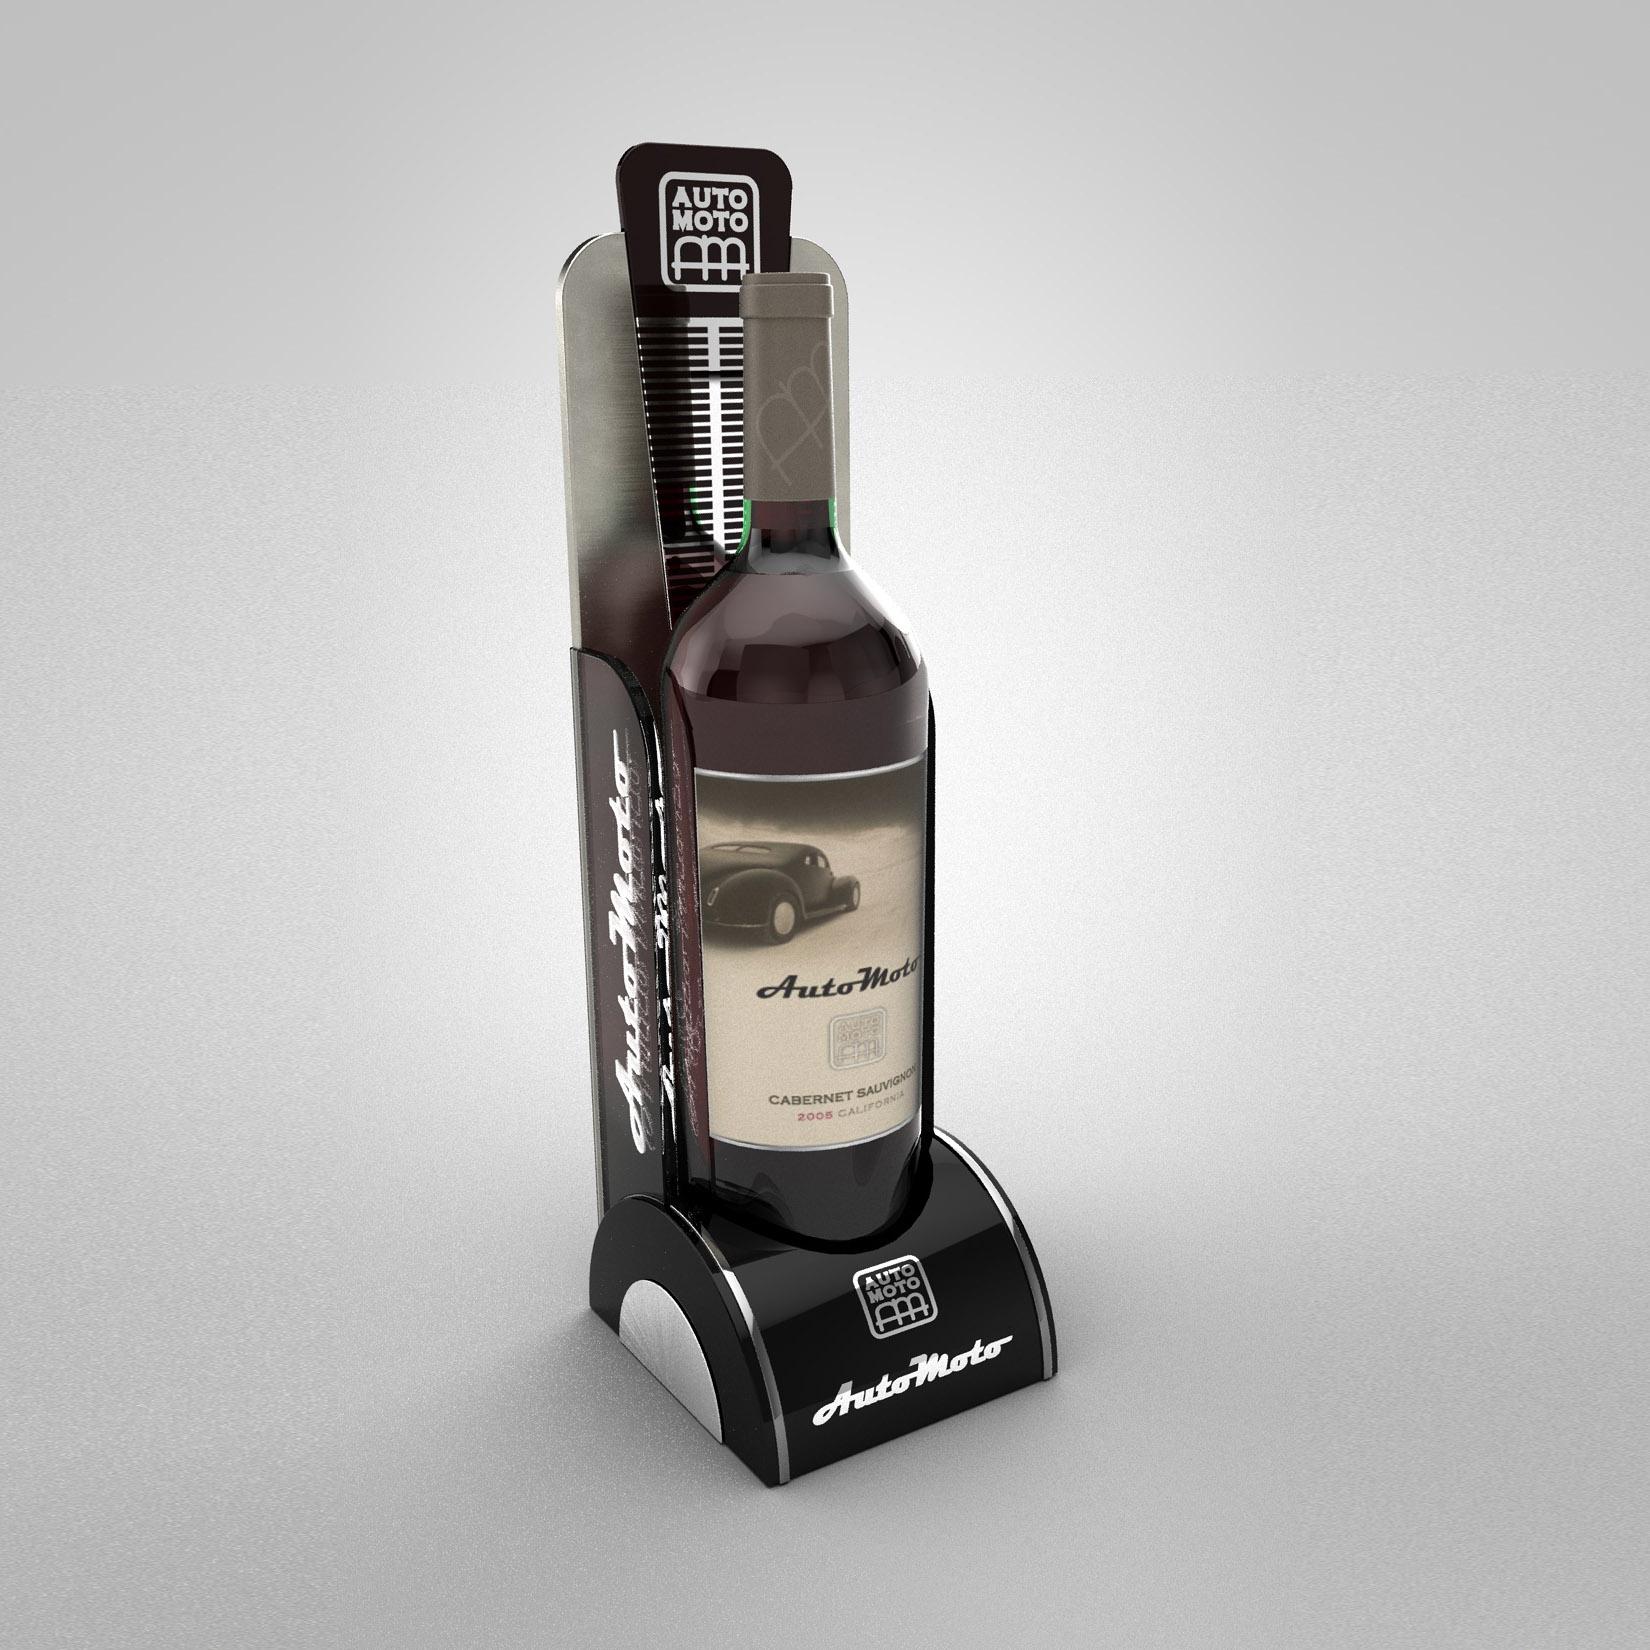 Automoto Wine Glorifier